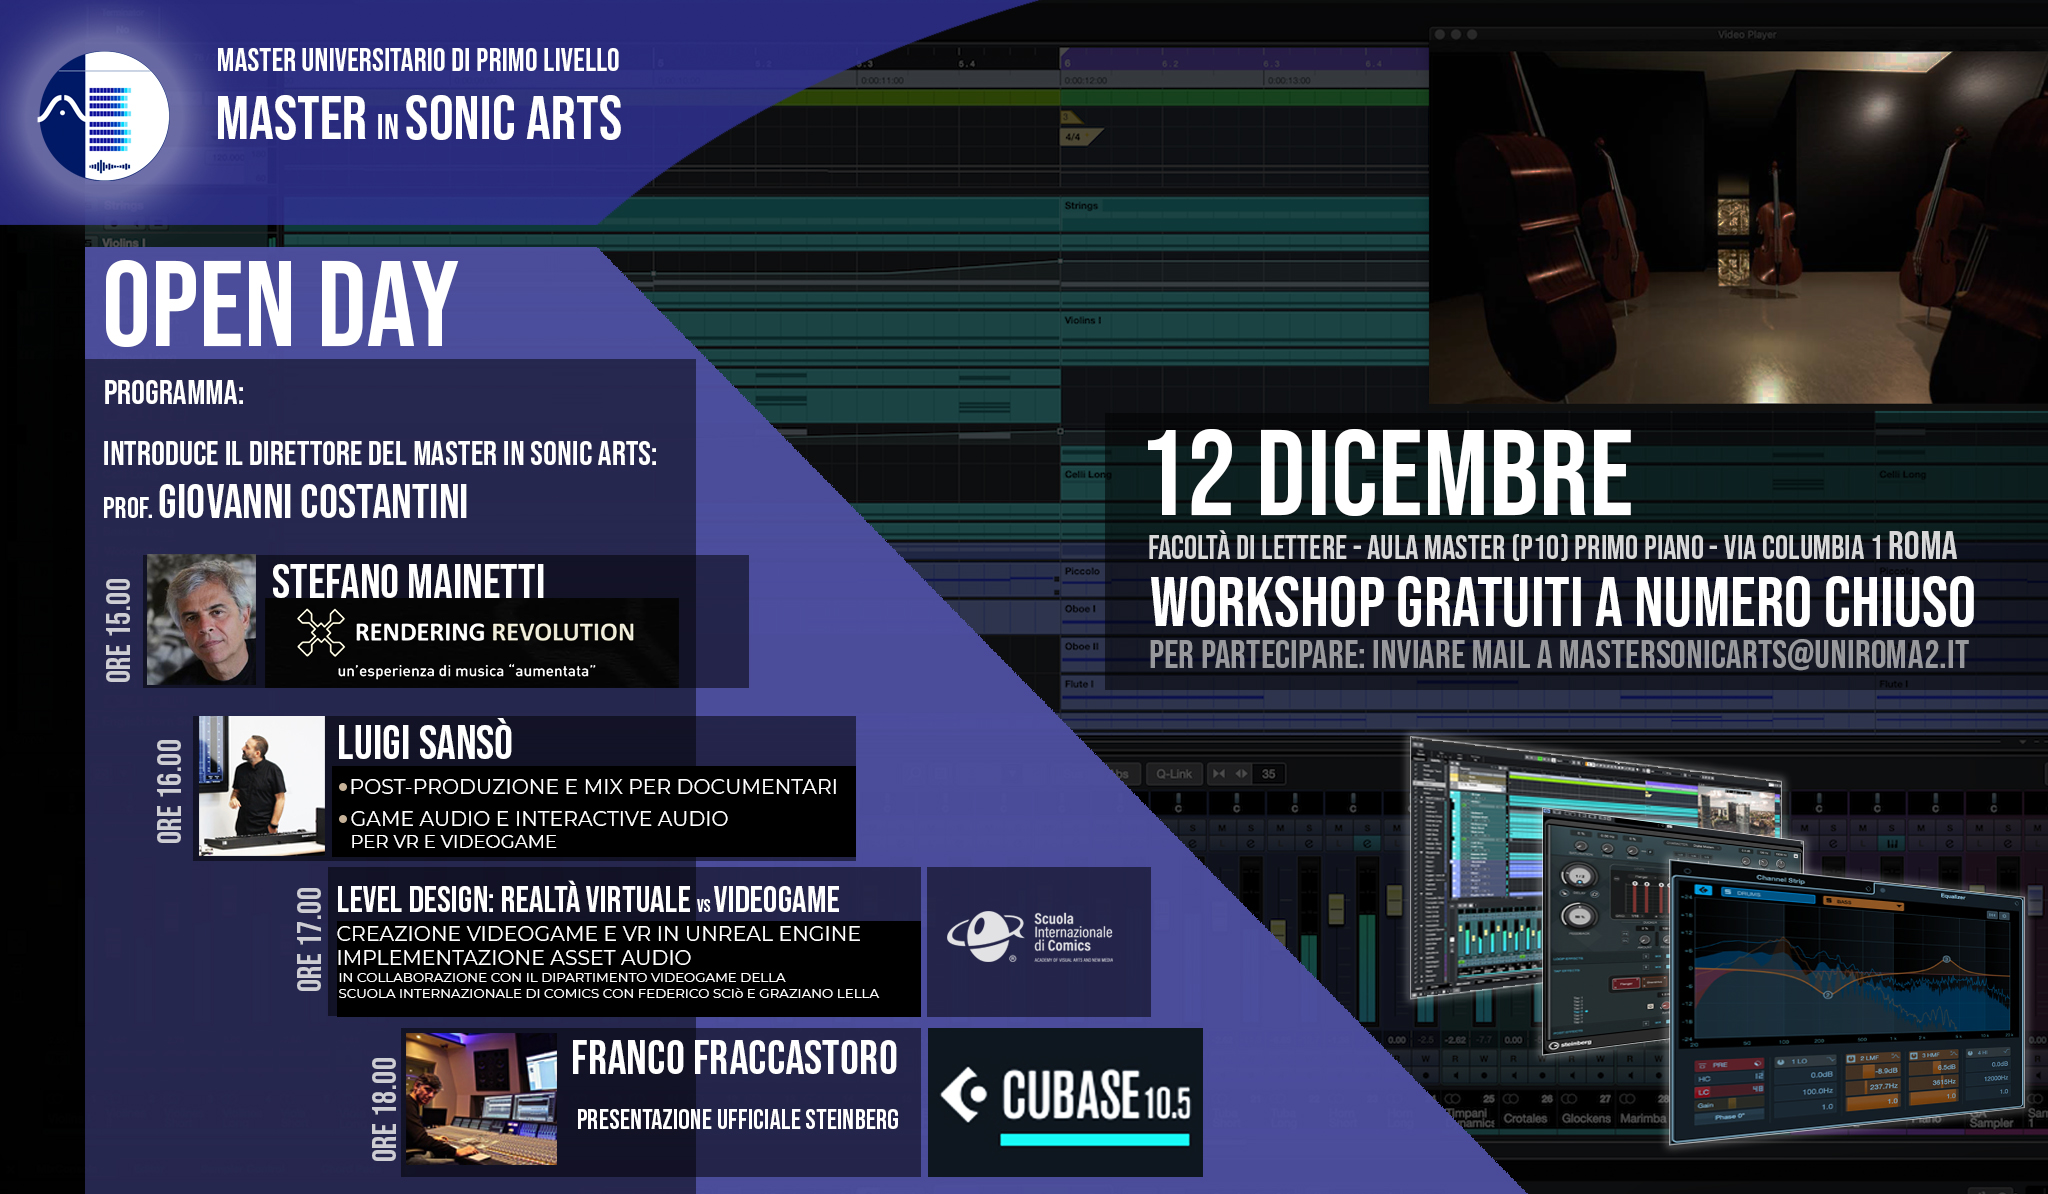 locandina 12 dicembre_open day